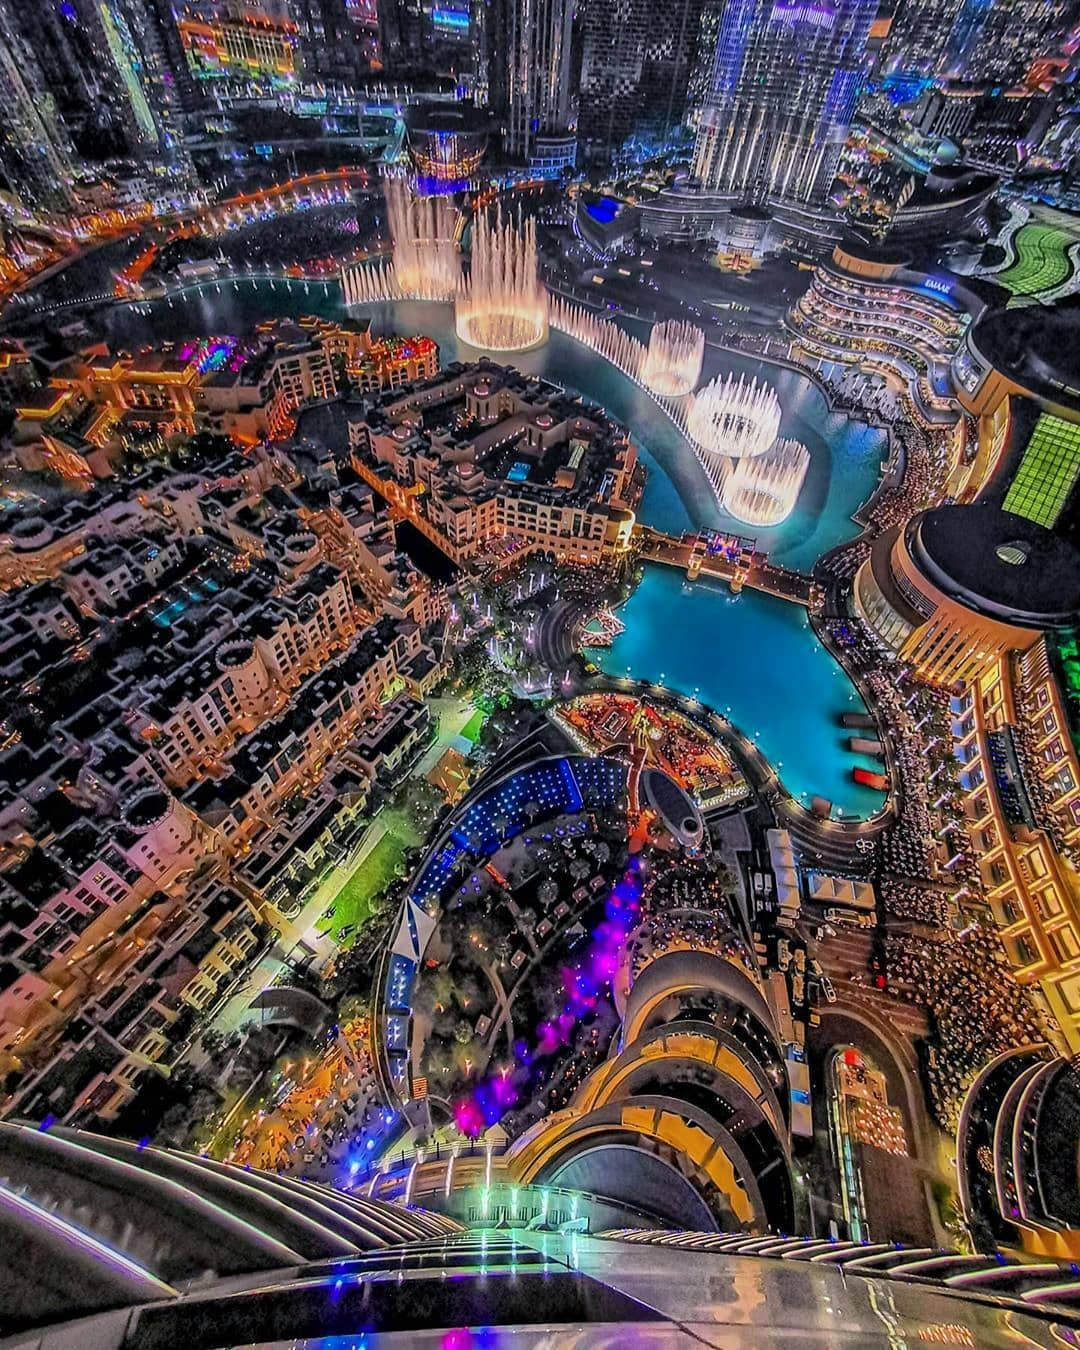 Amazing Dubai S Instagram Post Downtown Dubai At Night Photo By Abdulaziz Photos Dubai دبي Visitdubai Wonderful Dubai Visit Dubai Photo